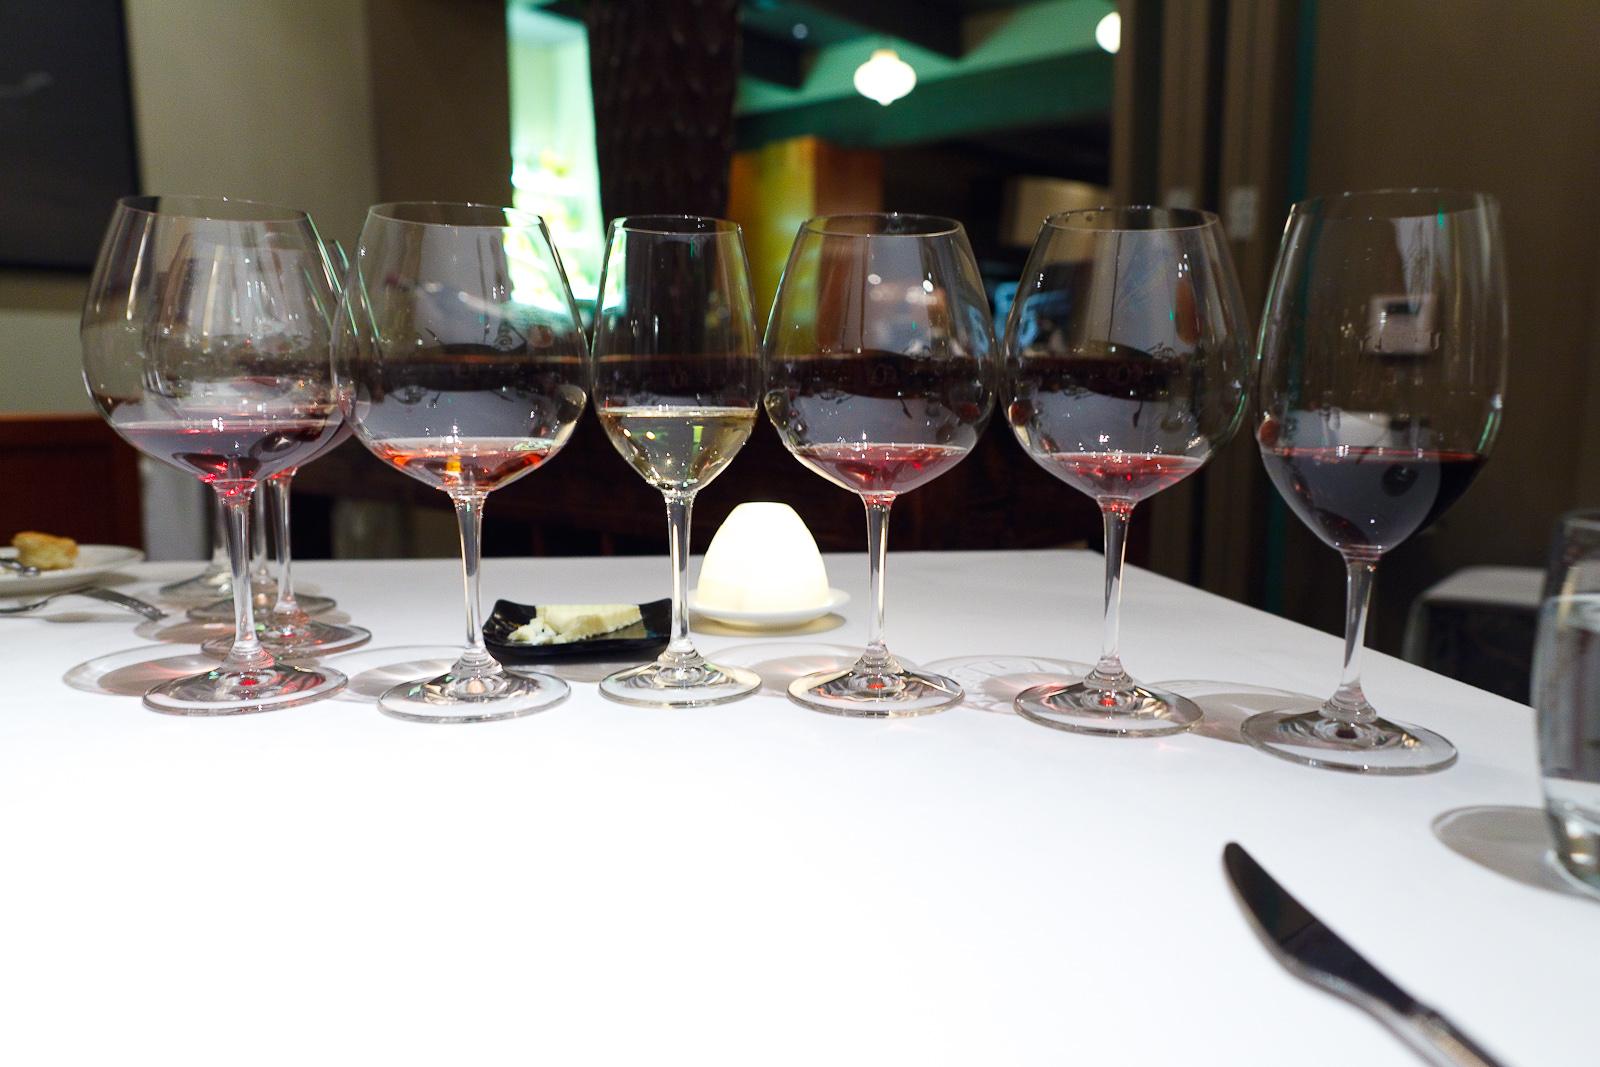 Wine pairing: 2009 COS Rami,9 Bruno Clair Pino Noir Marsanny, 2007 Domaine de la Tournelle, 2007 Jacques Puffeney, 2008 Domaine Maume Gevrey-Chambertin, 2008 Pride Mountain Cabernet